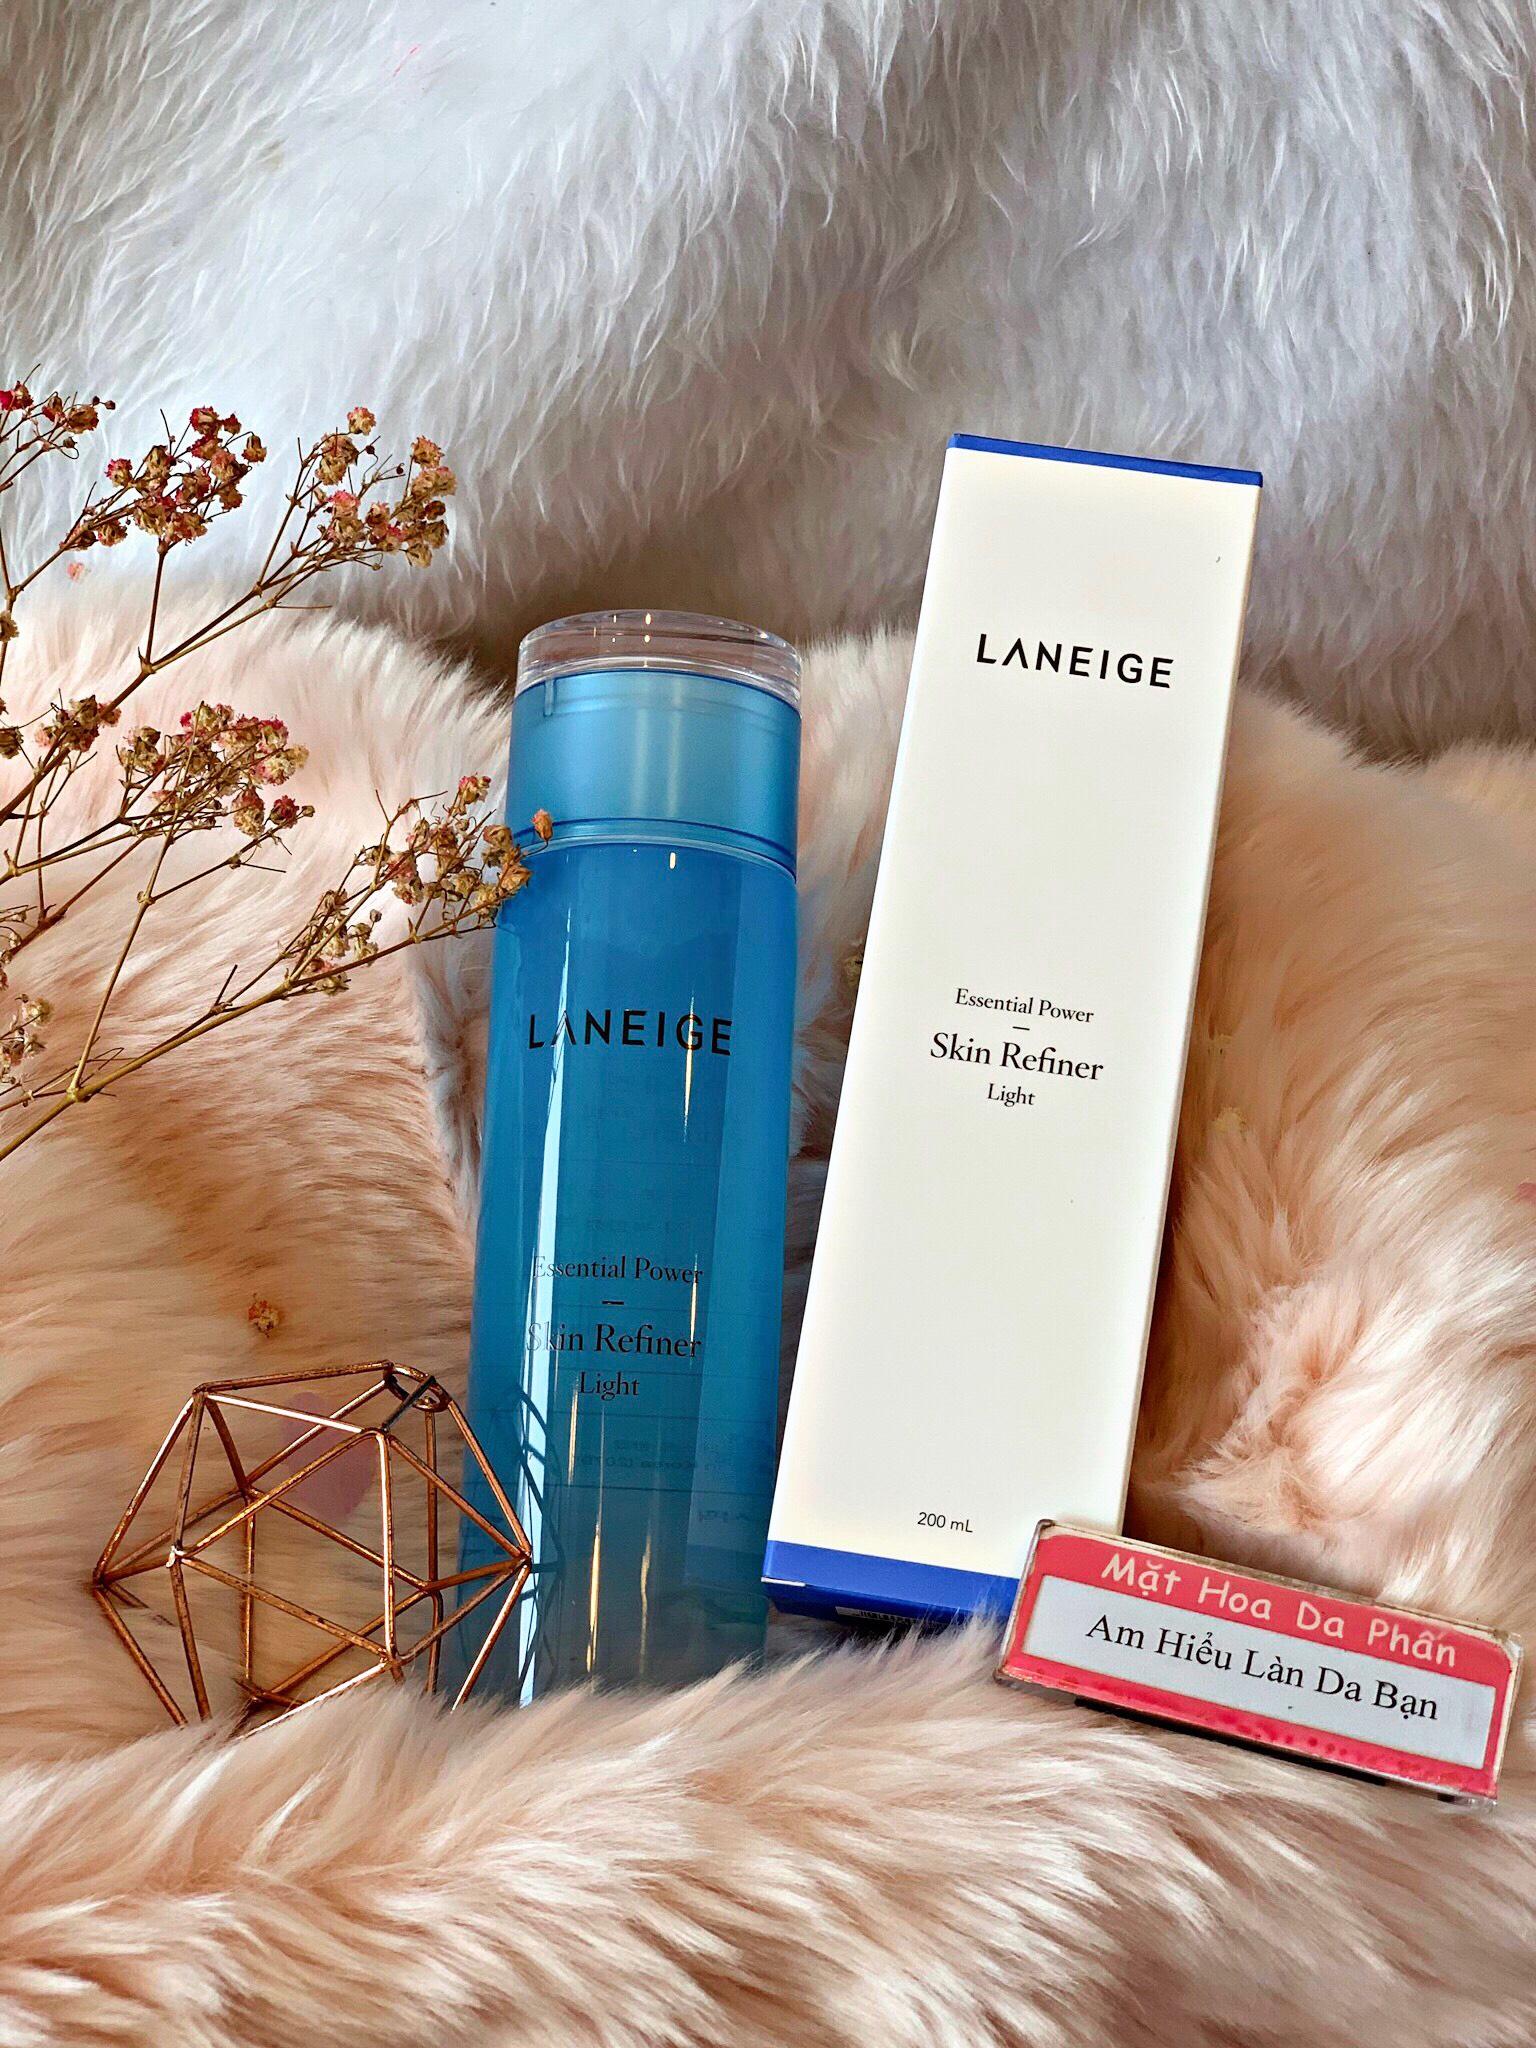 Nước Cân Bằng Laneige Essential Power Skin Refiner #Light